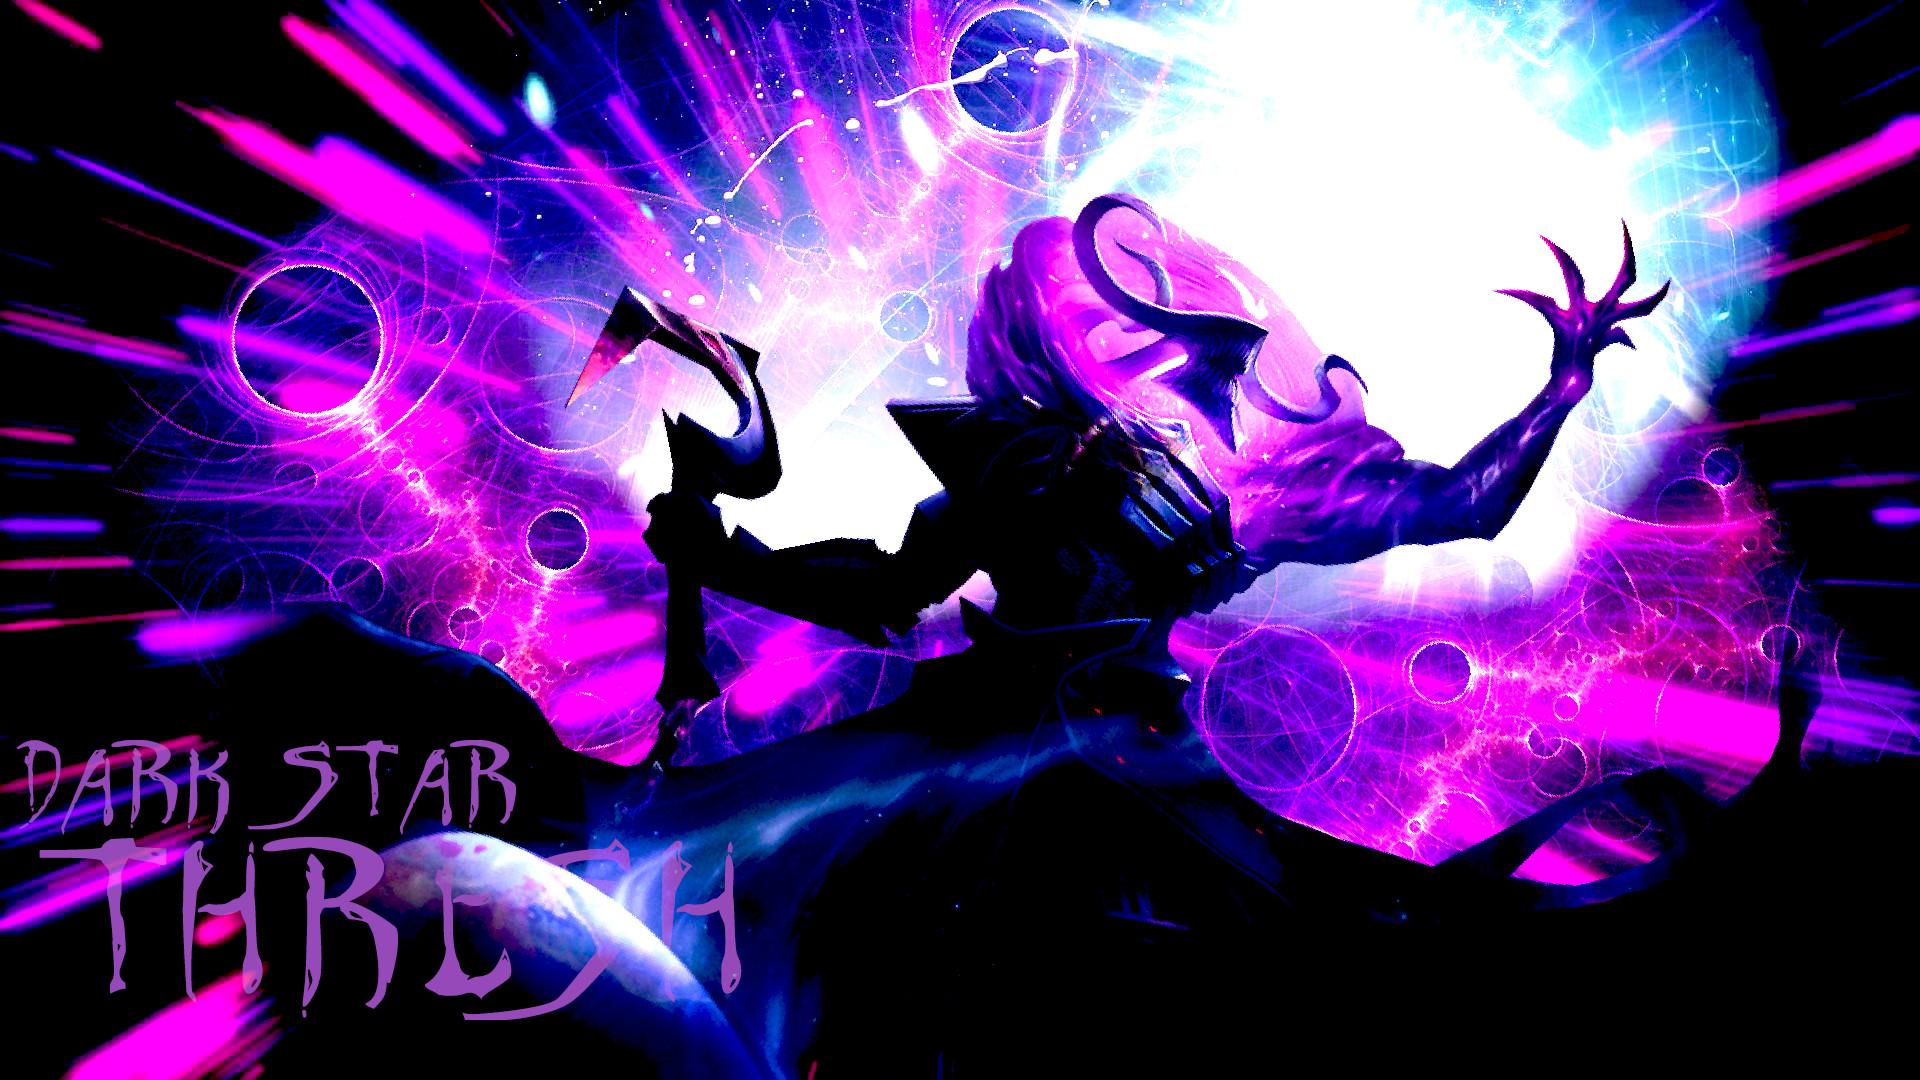 By Leoelmaximo by Leoelmaximo23 Dark Star Thresh Wallpaper! By Leoelmaximo  by Leoelmaximo23